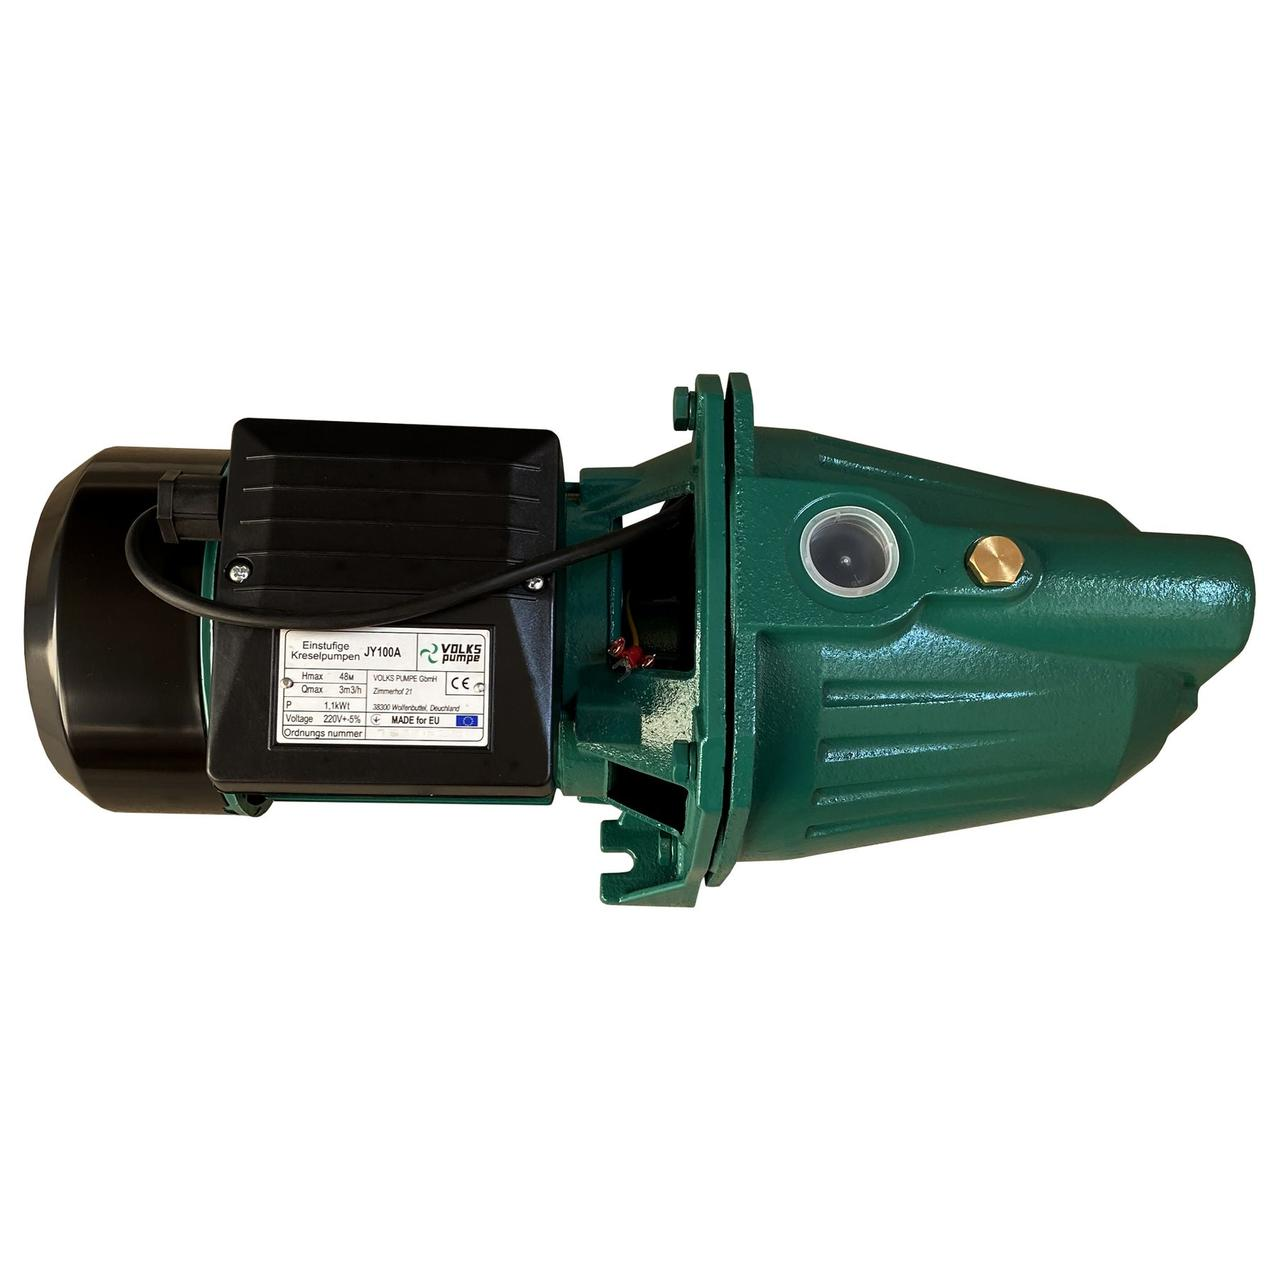 Насос центробежный Volks pumpe JY100A 1,1 кВт чугун длинный